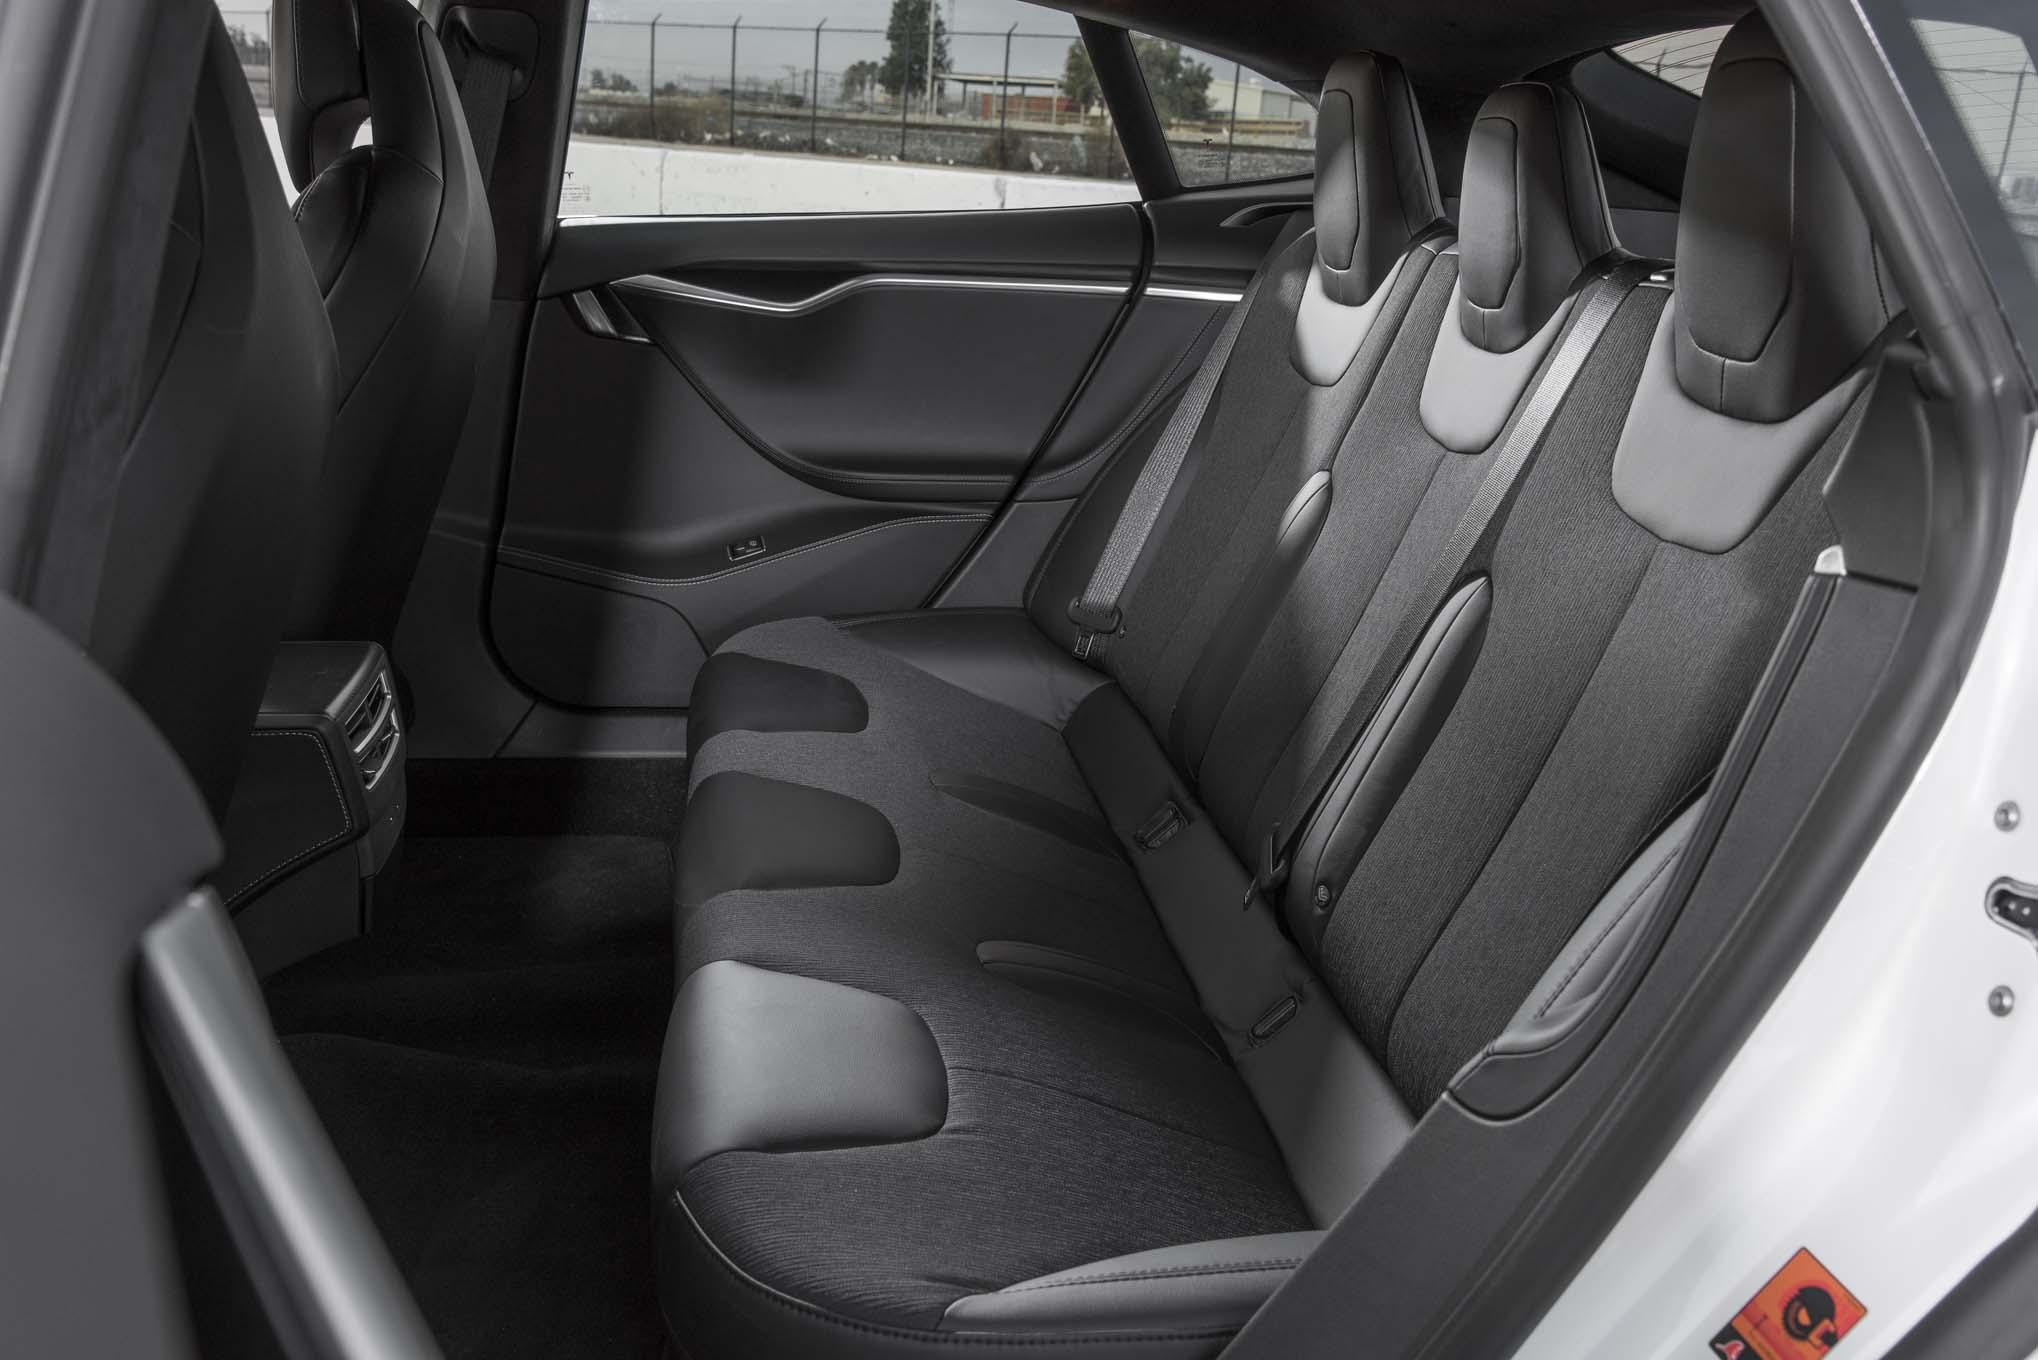 2017-Tesla-Model-S-P100D-rear-interior-seats - Motor Trend ...